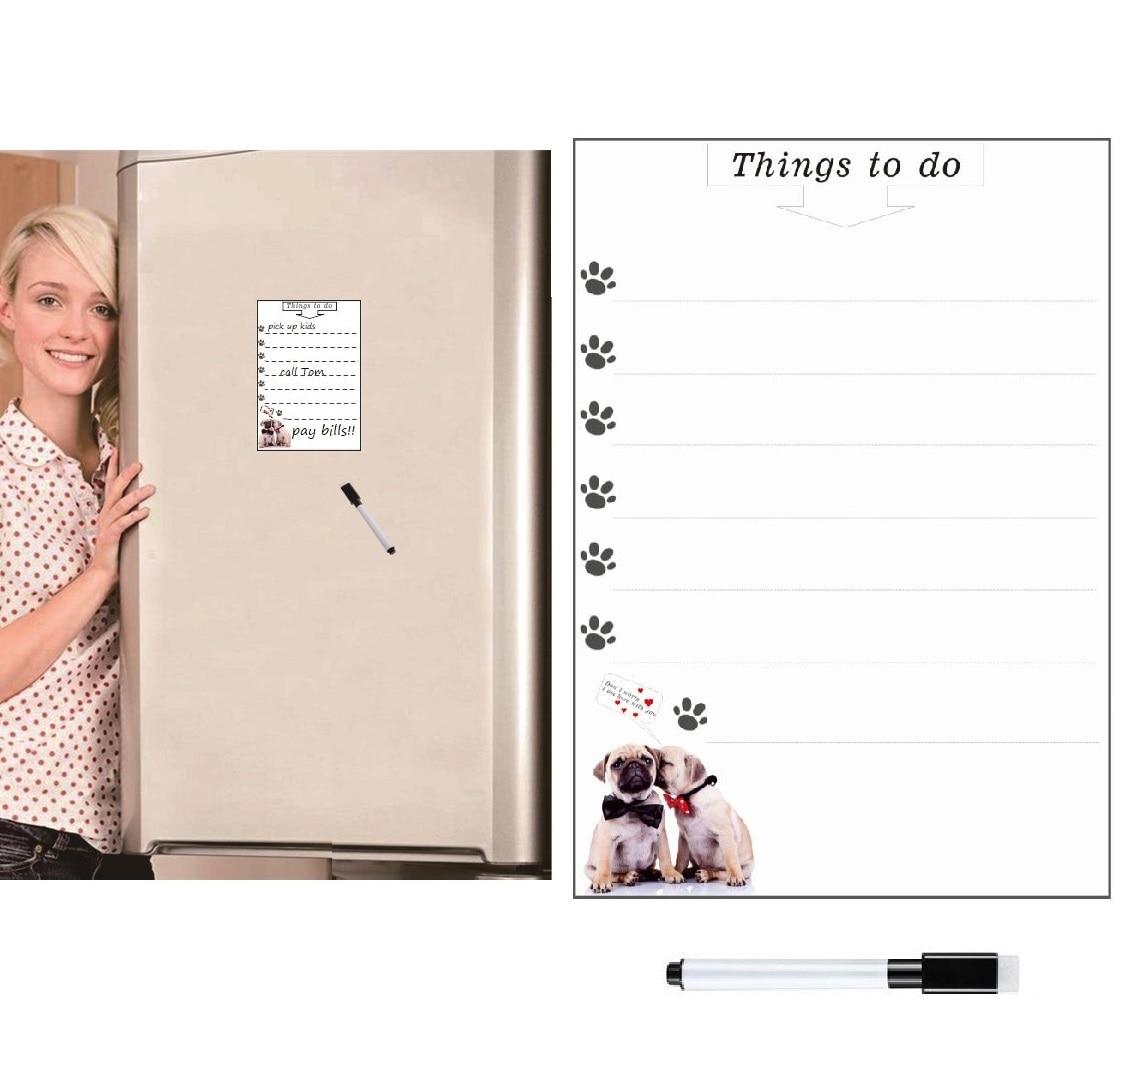 Erasable Magnetic Whiteboard White Board For Fridge Magnet Sticker Weekly Planner To Do List Cute Dog Message Board Marker Pen